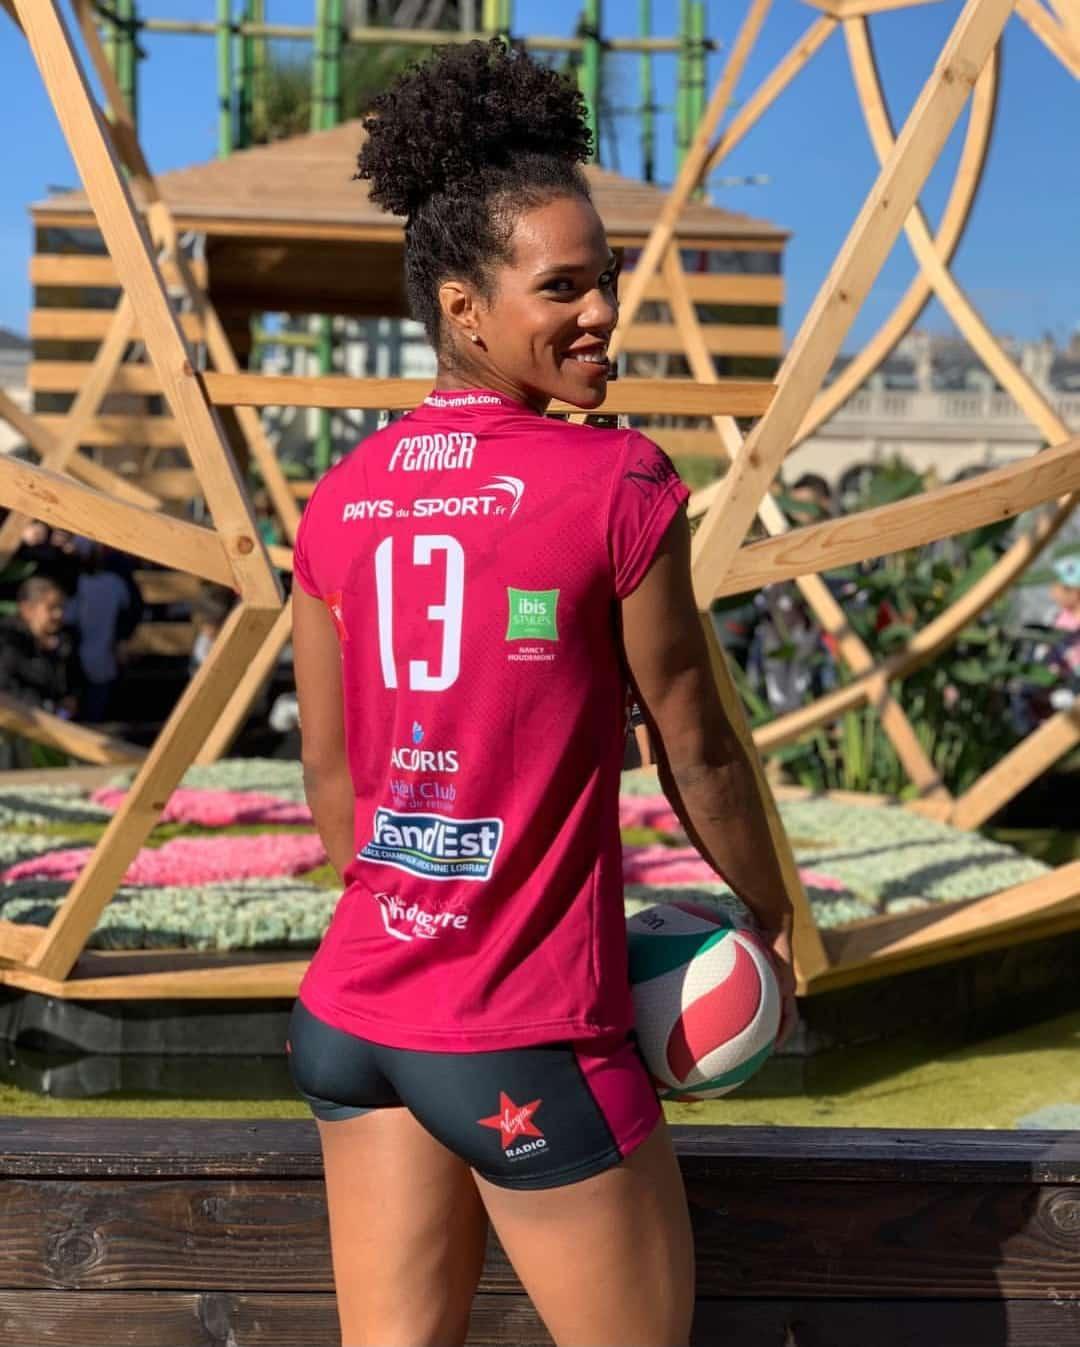 nouveau-maillot-volley-vandoeuvre-nancy-volley-ball-errea-2018-2019-laf-lnv-4